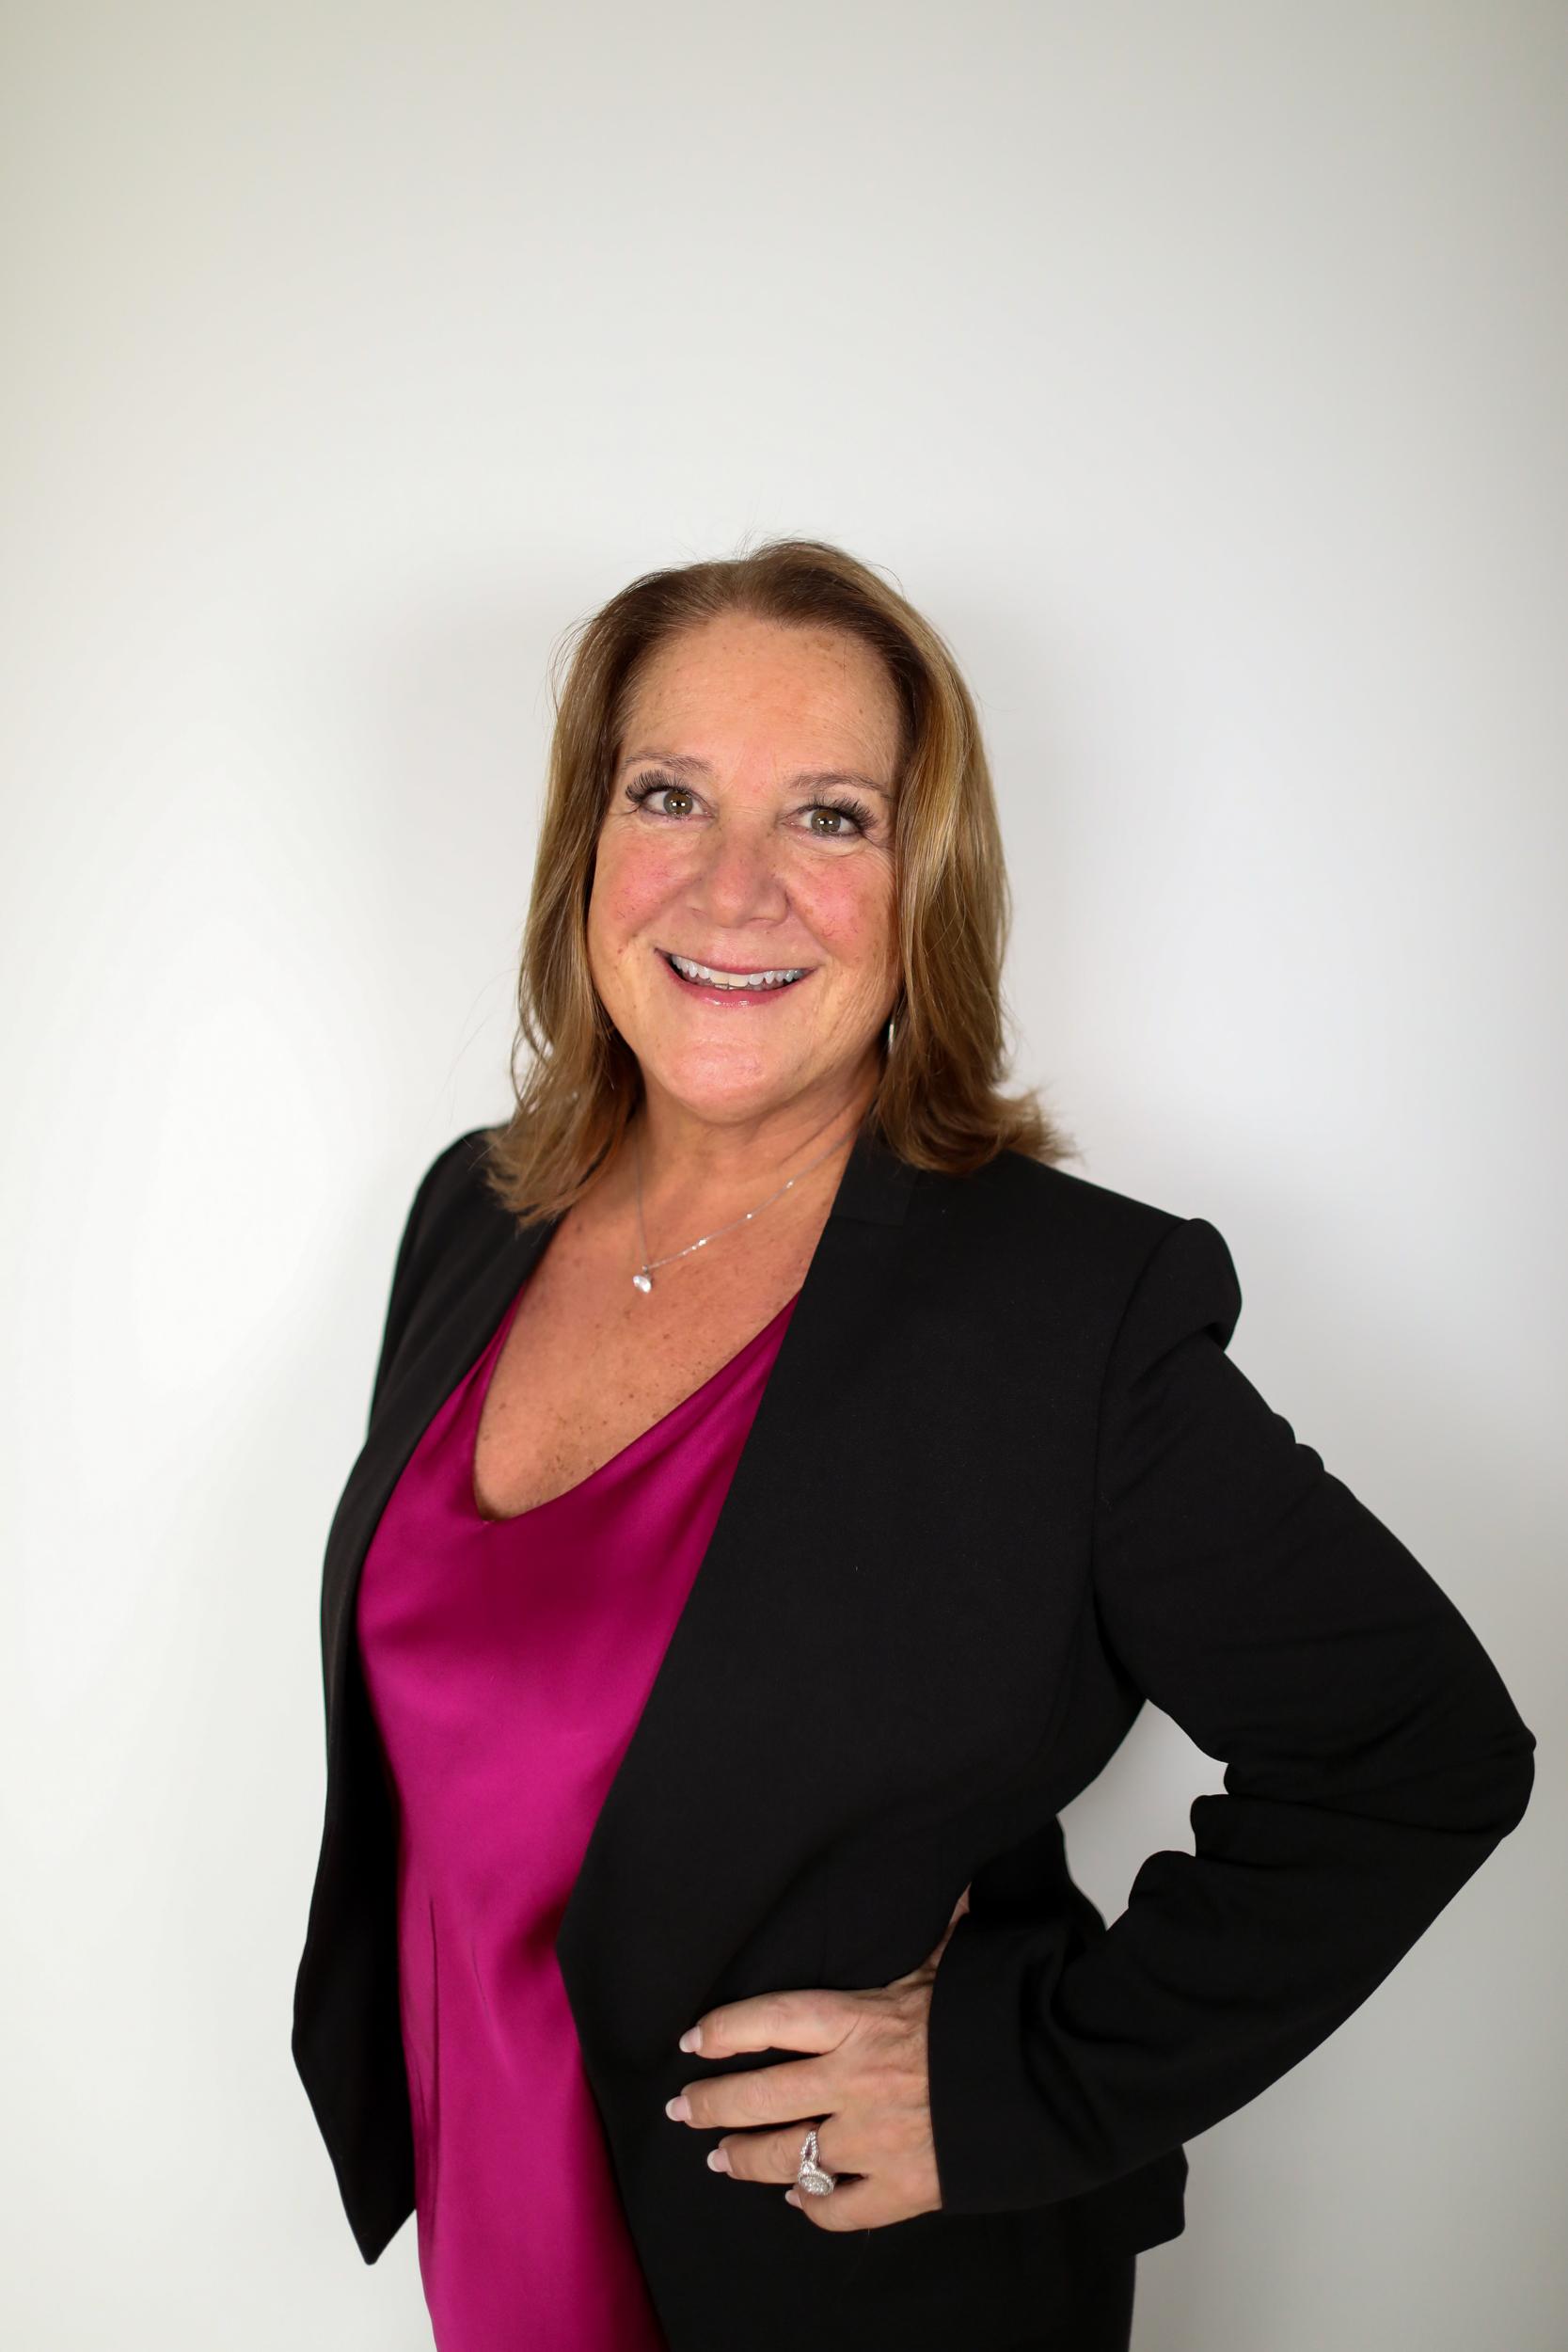 Brenda Maggy